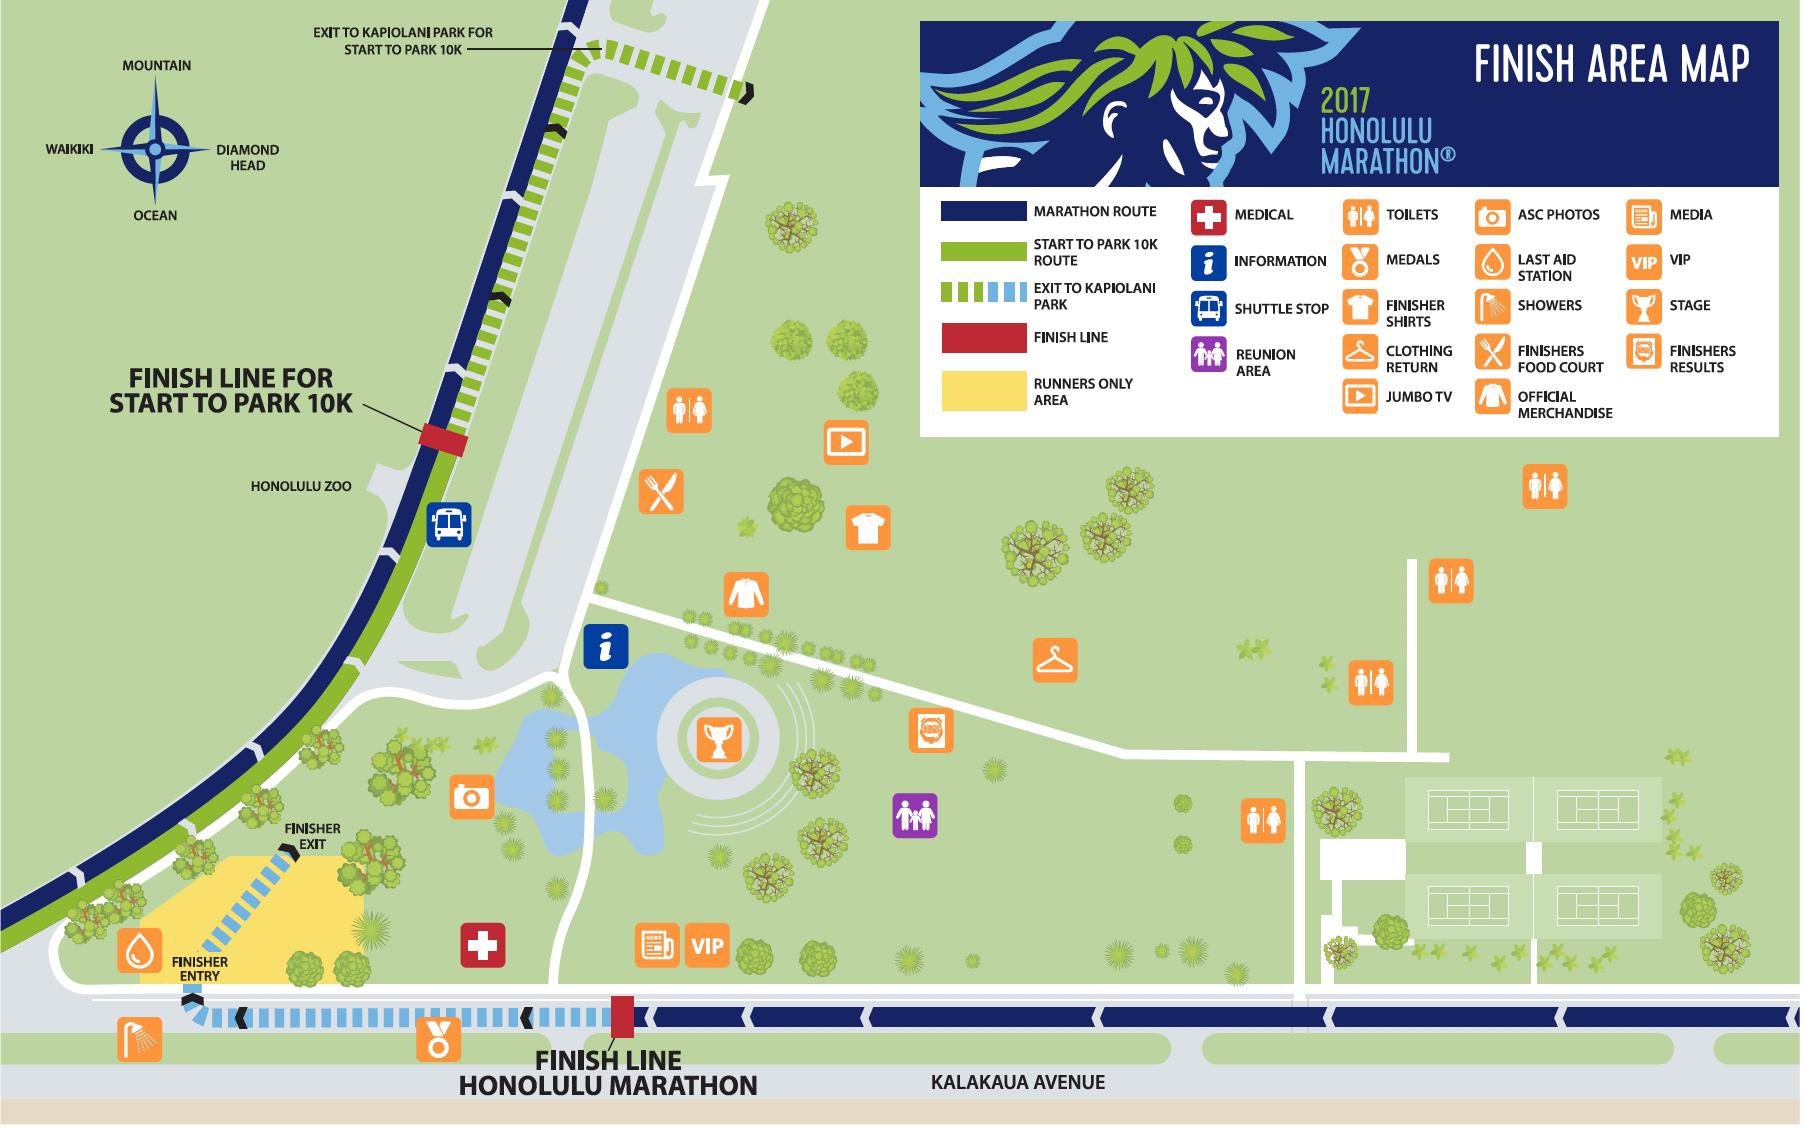 Finish Area : Honolulu Marathon